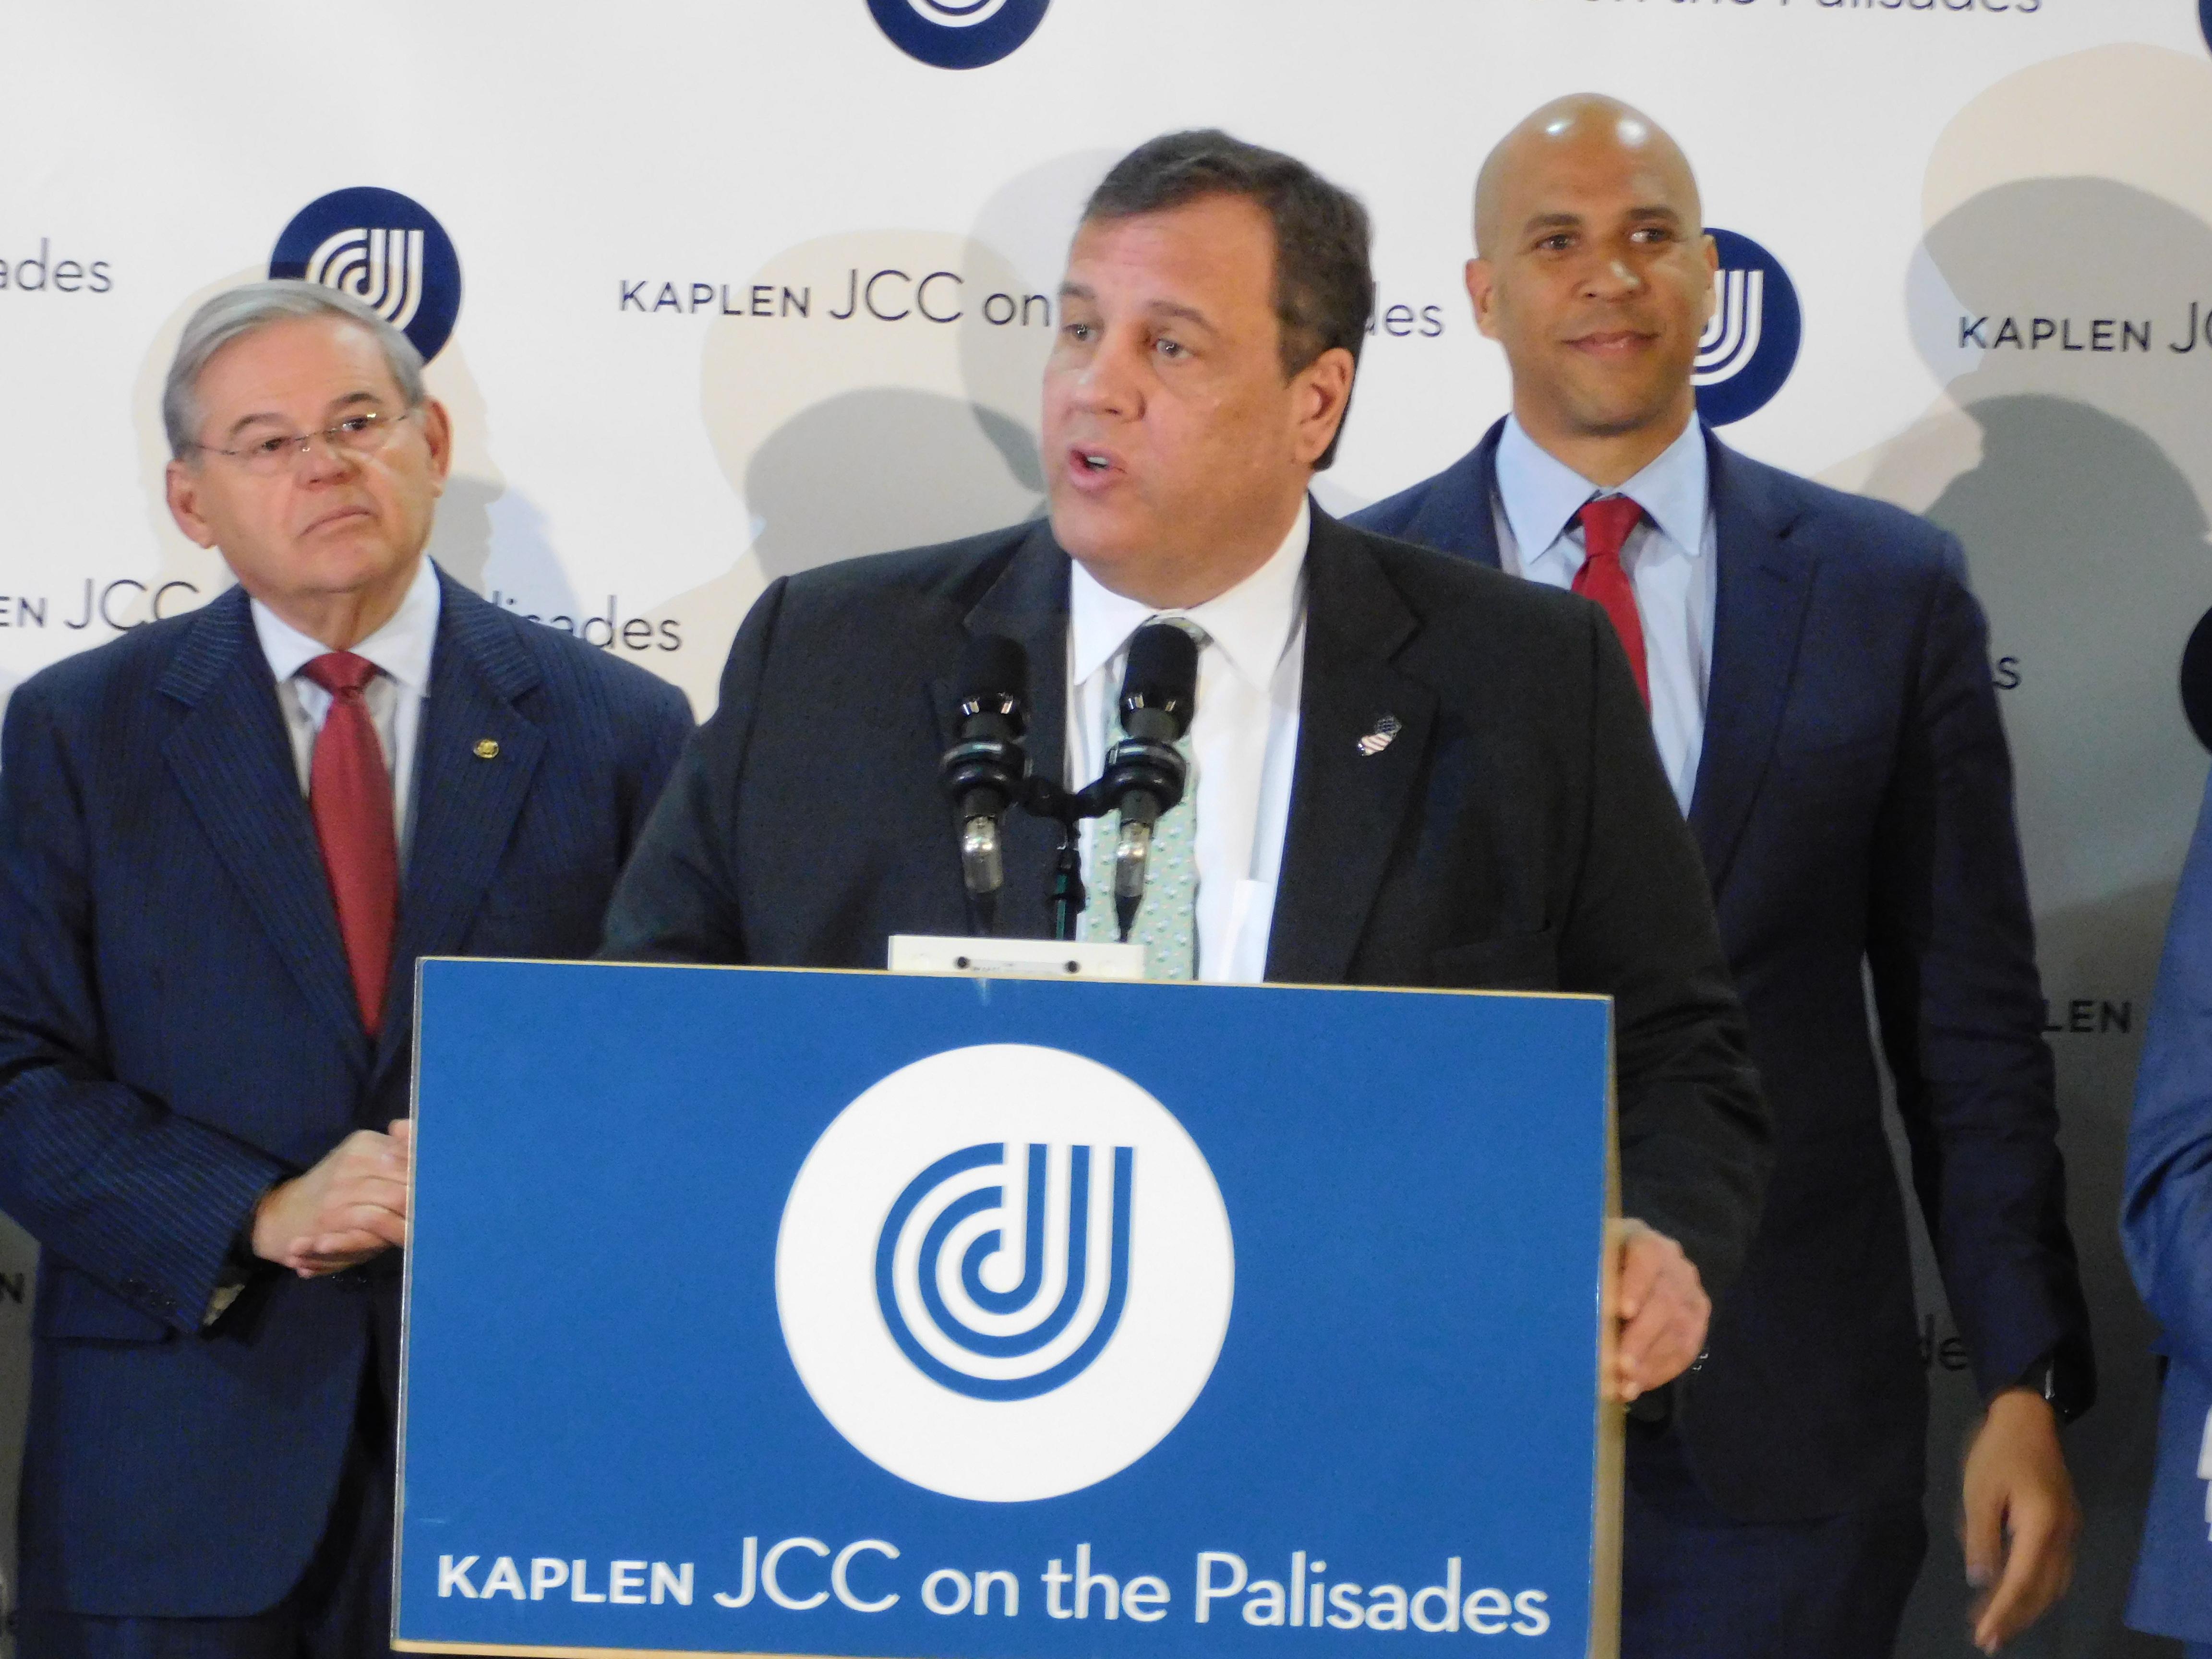 New Jersey Governor Chris Christie stands with U.S. Senators Bob Menendez and Cory Booker.